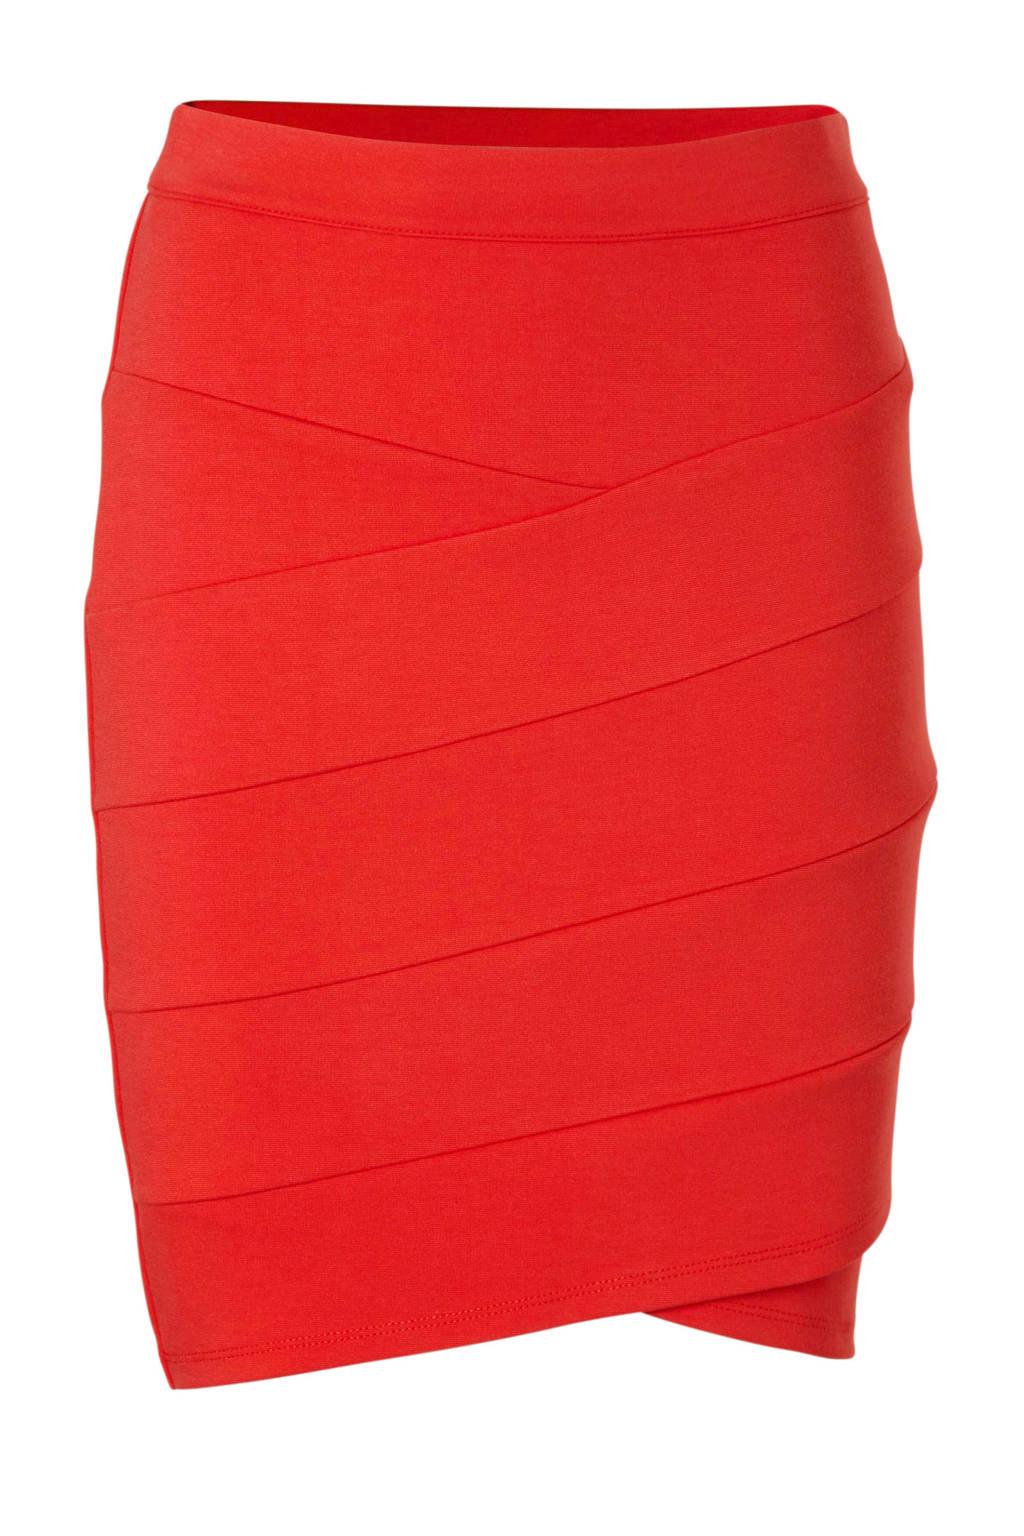 Saint Tropez rok rood, Rood